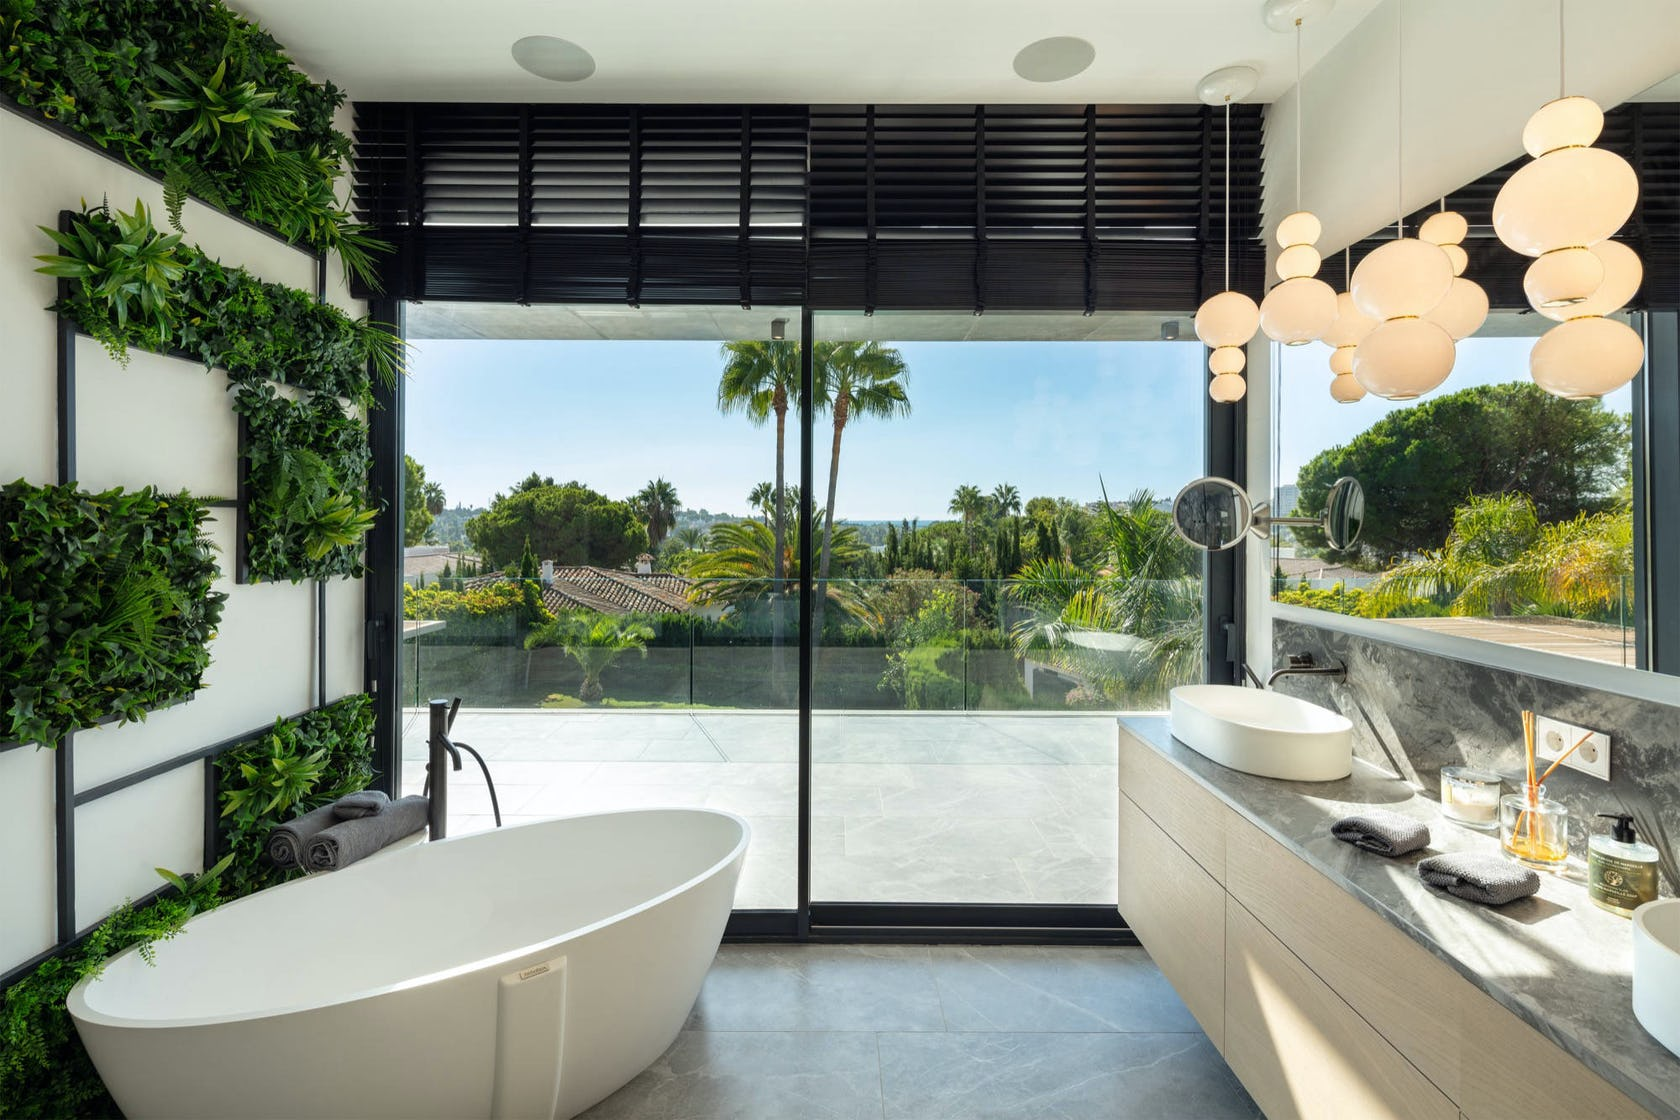 bathtub tub interior design indoors door